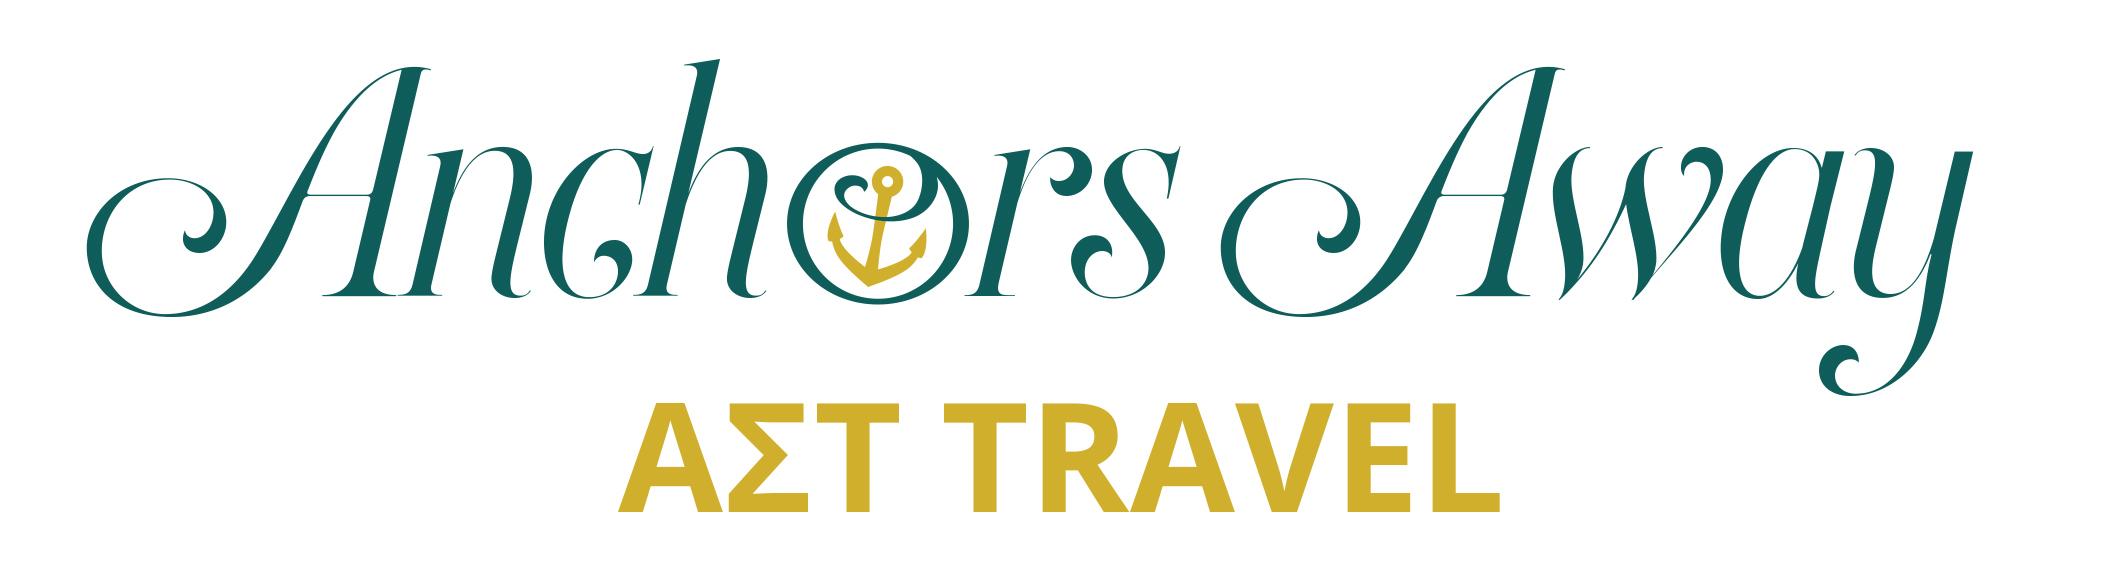 Anchors Away Travel Logo_Samples_4